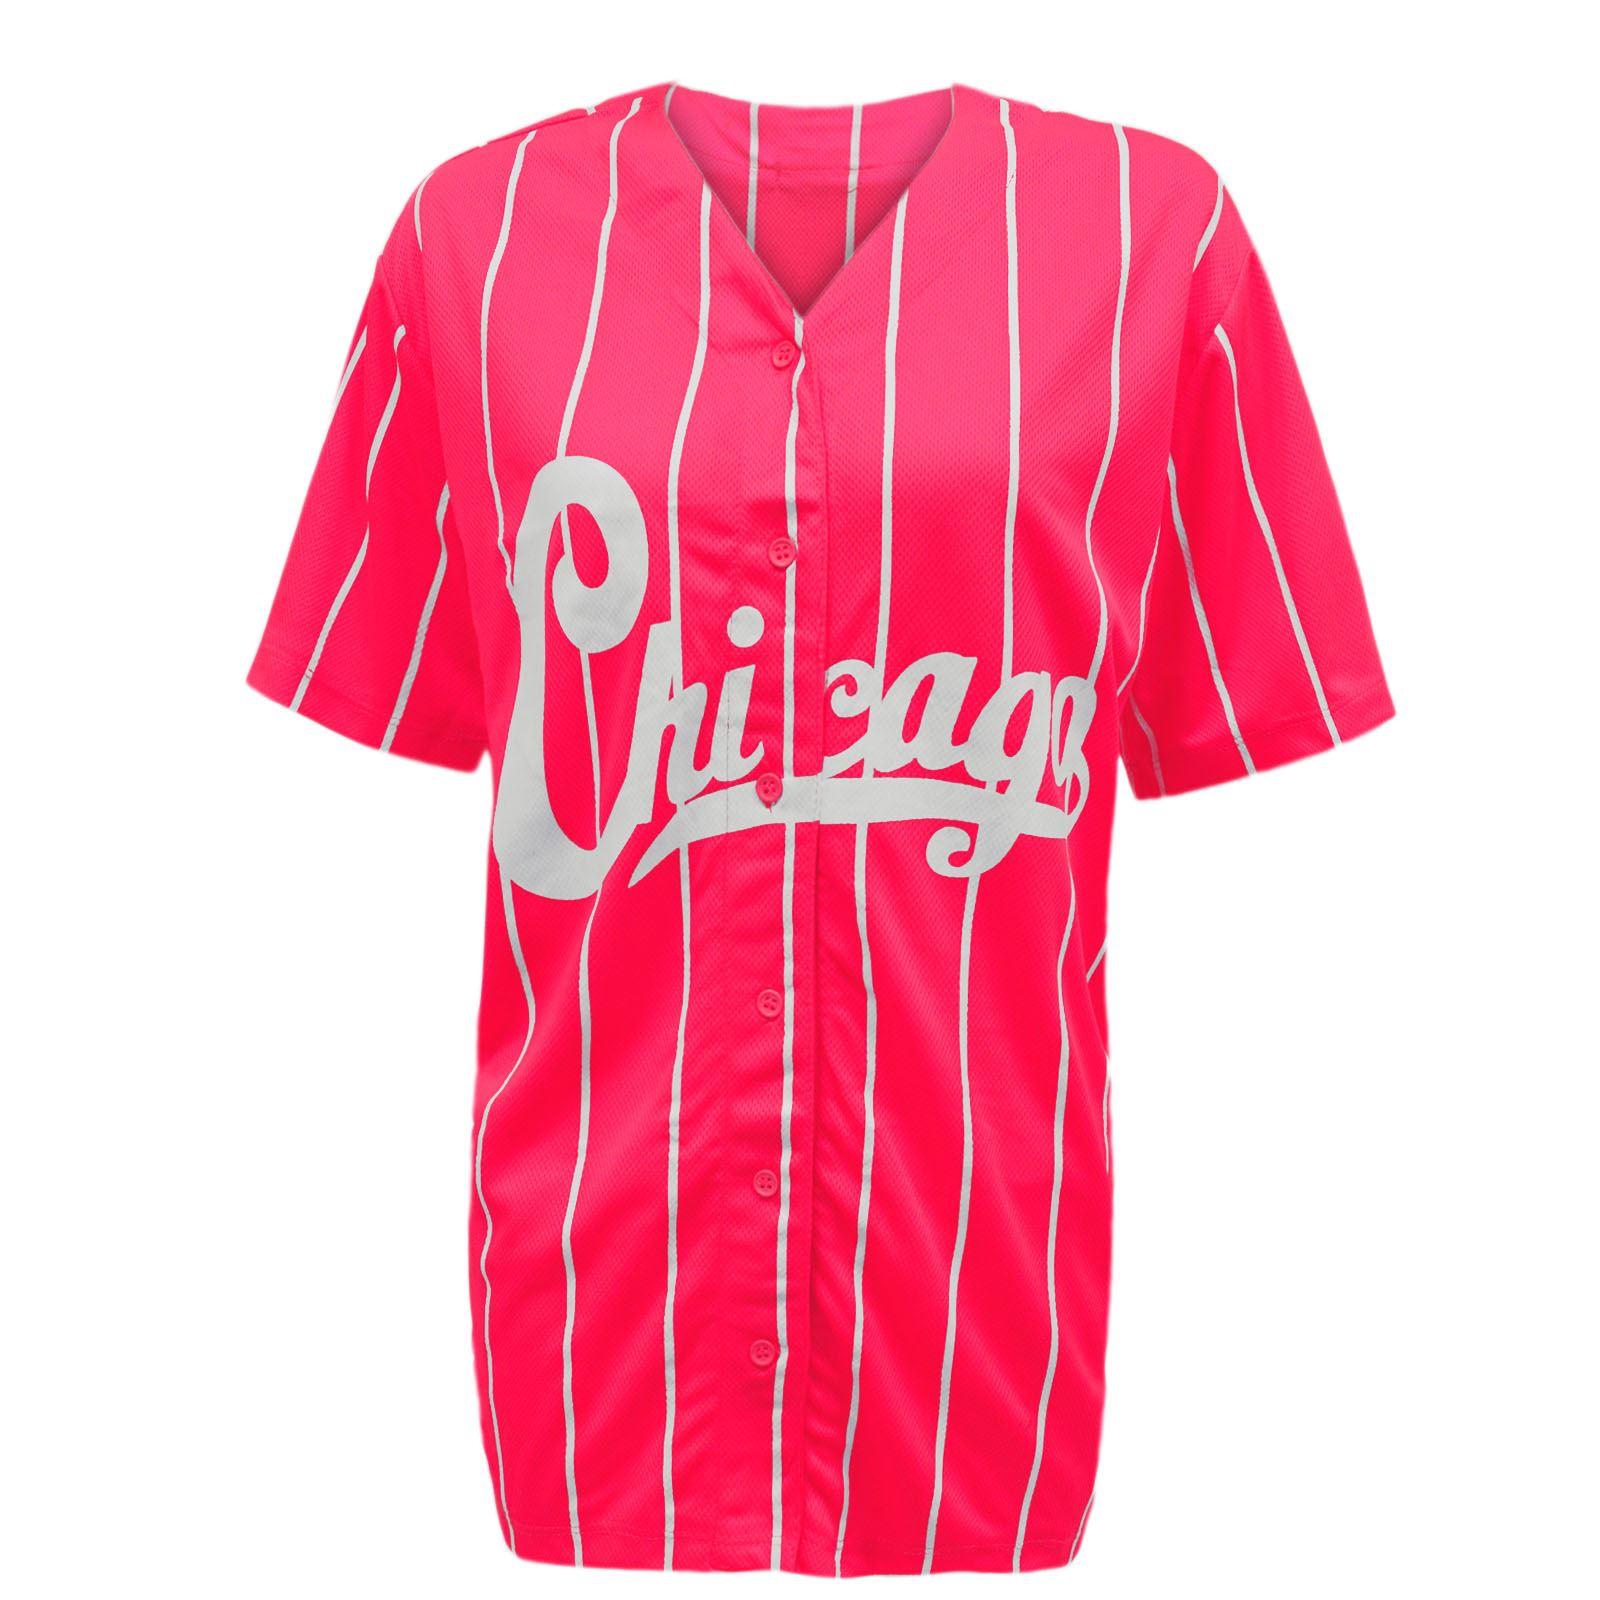 New womens ladies chicago stripes american baseball for Baseball jersey shirt dress